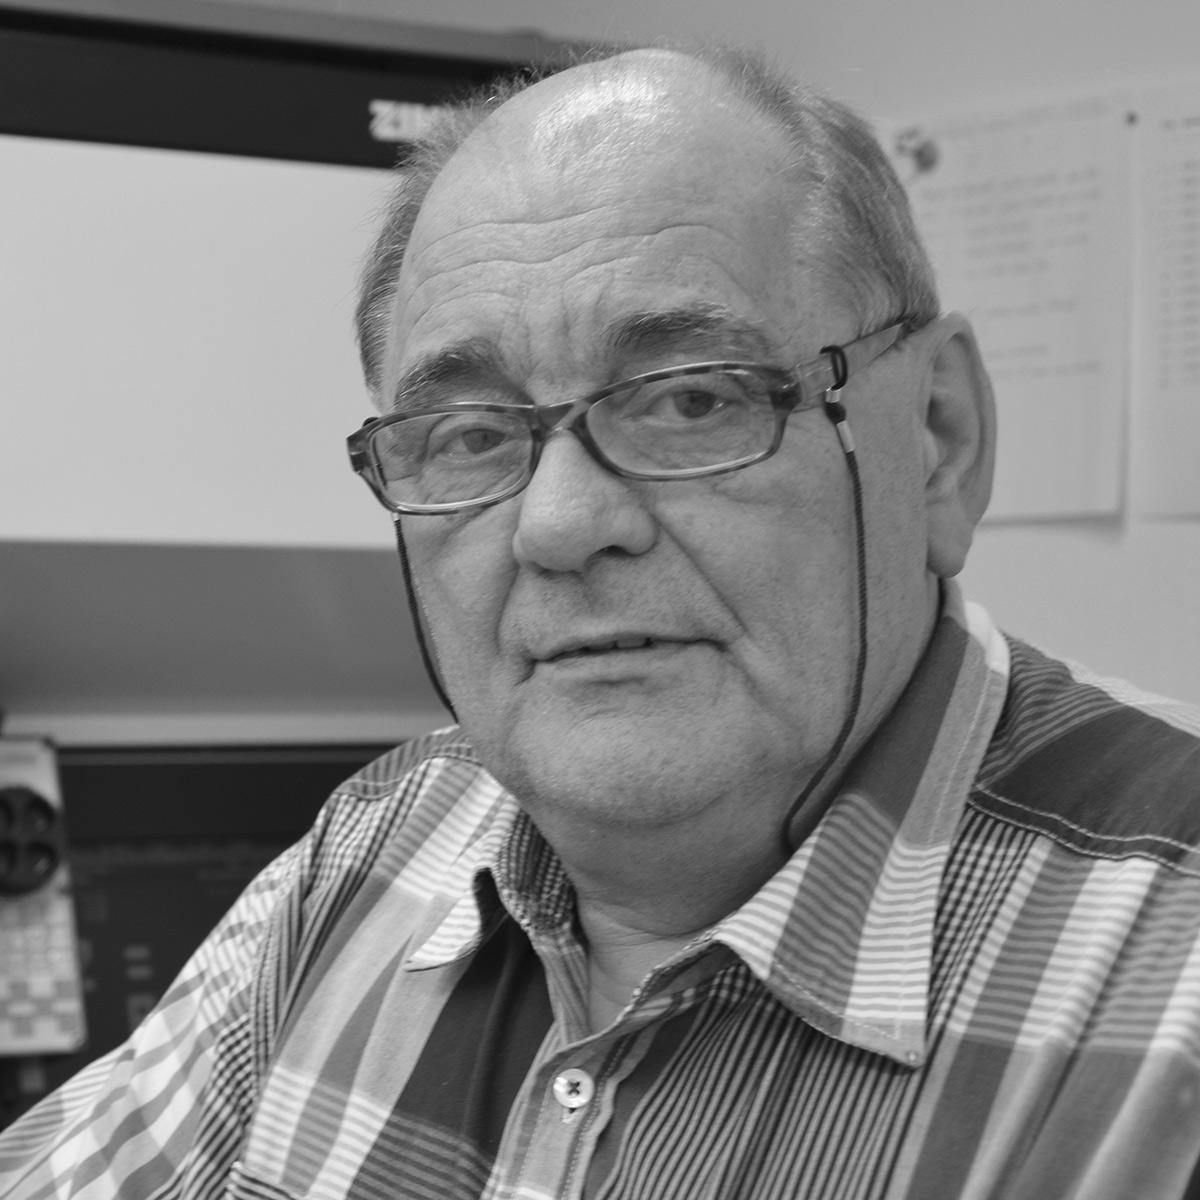 Michael Motzkus